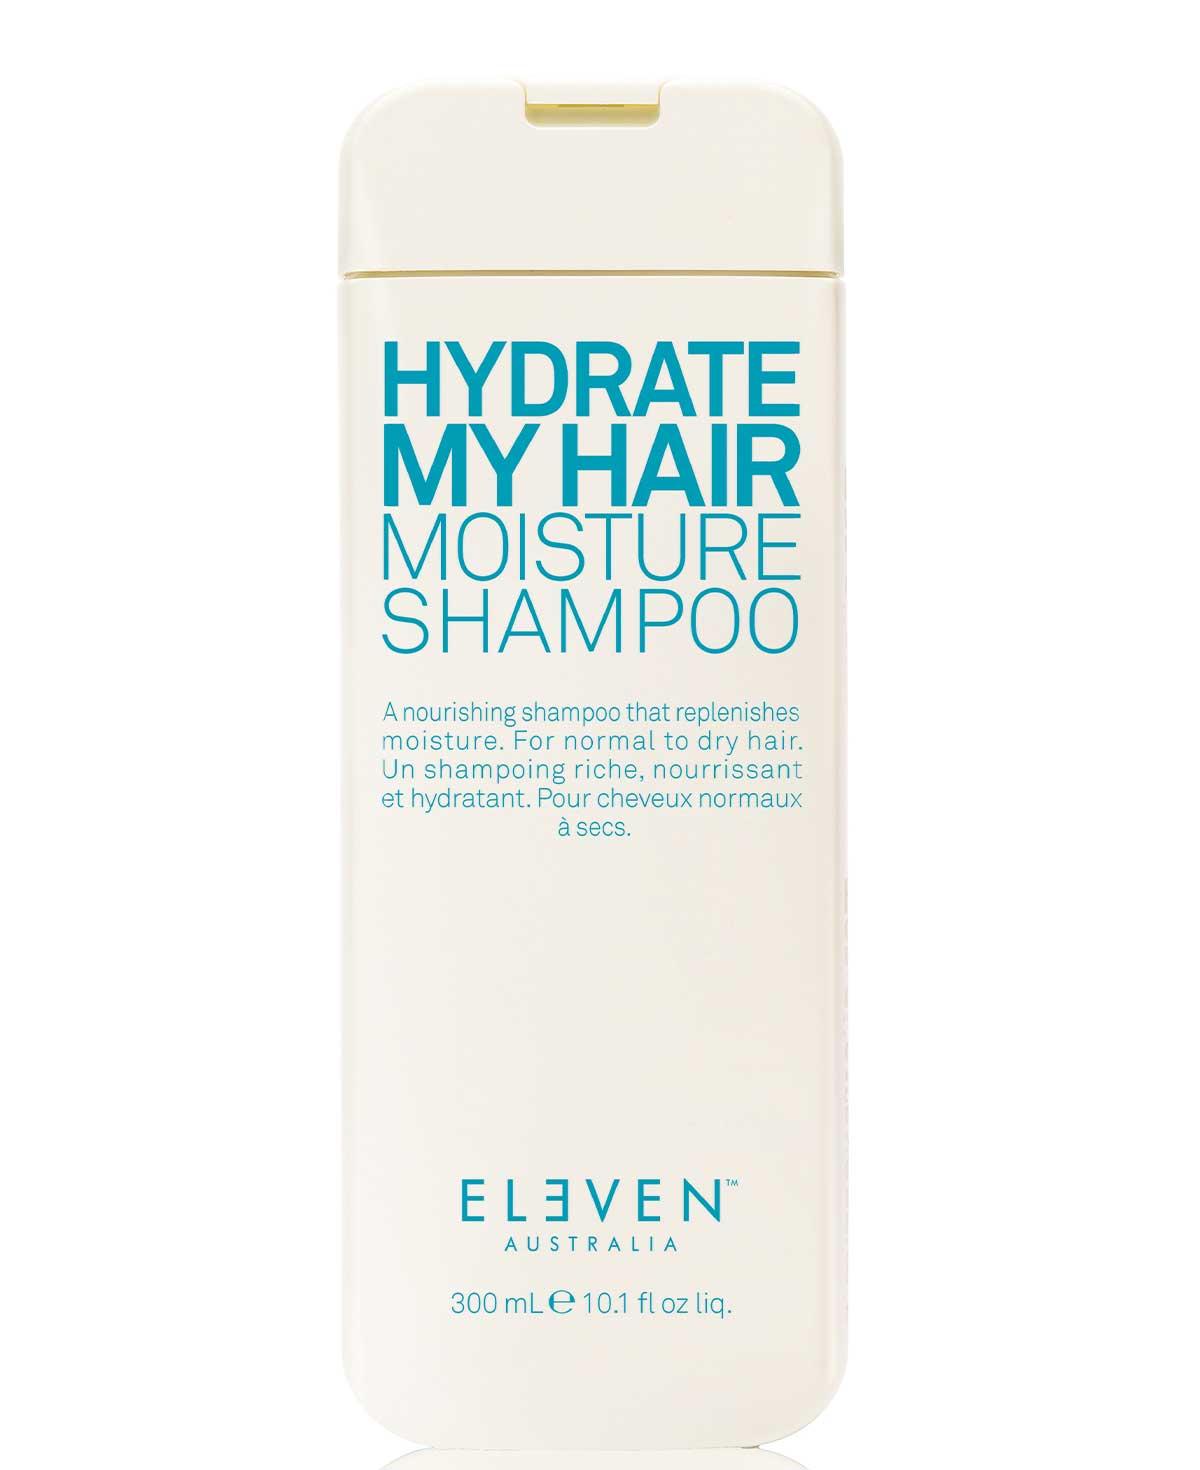 Eleven Hydrate My Hair Moisture Shampoo 300ml